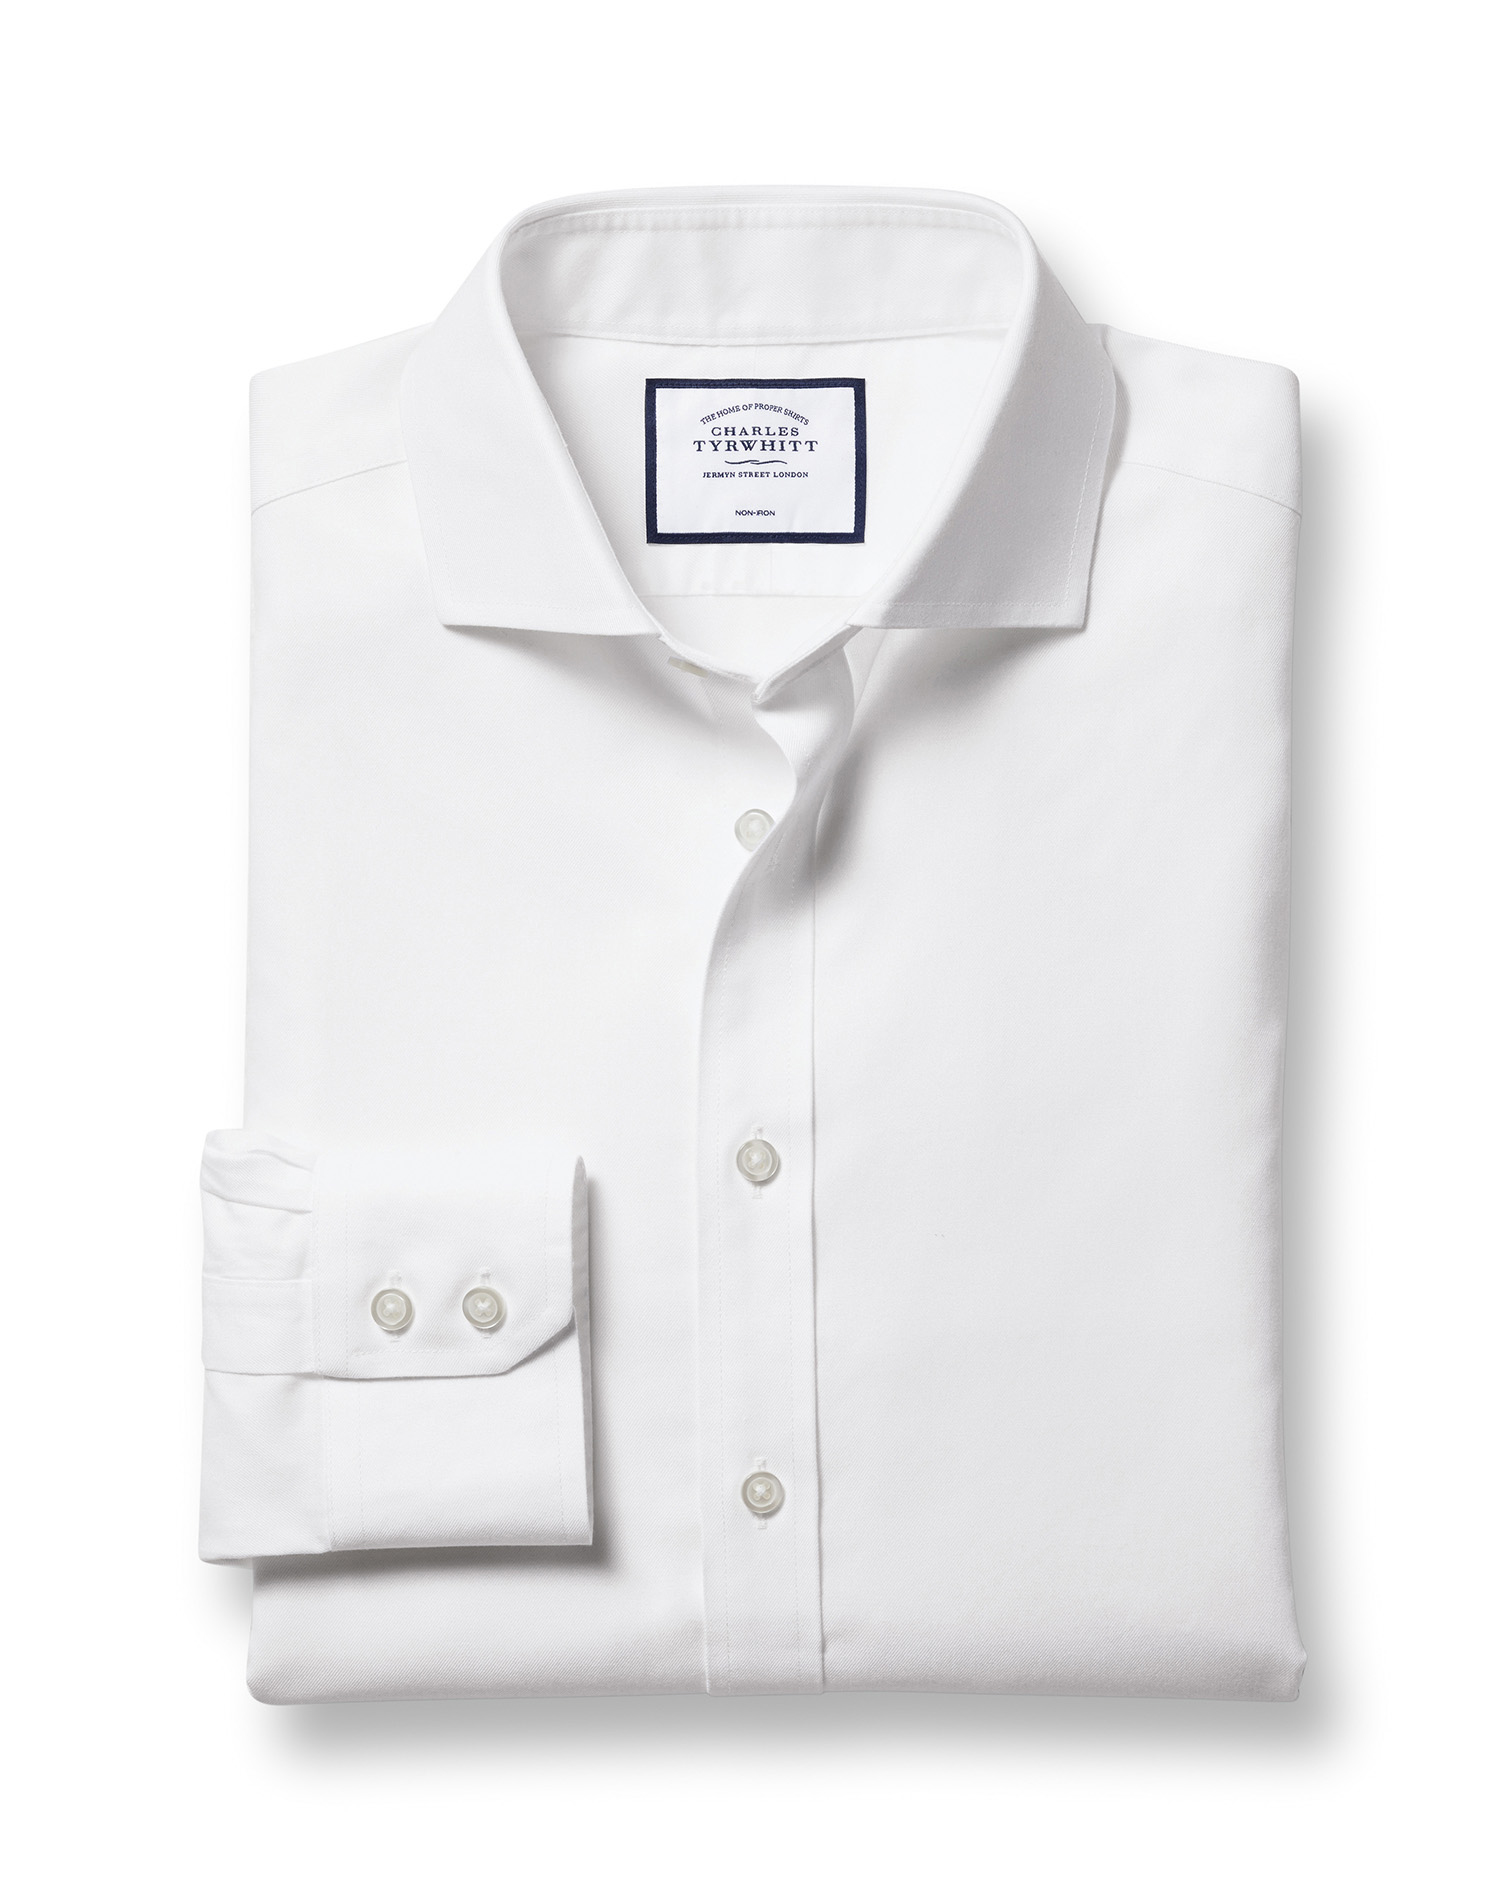 Cotton Slim Fit White Non-Iron Twill Cutaway Shirt